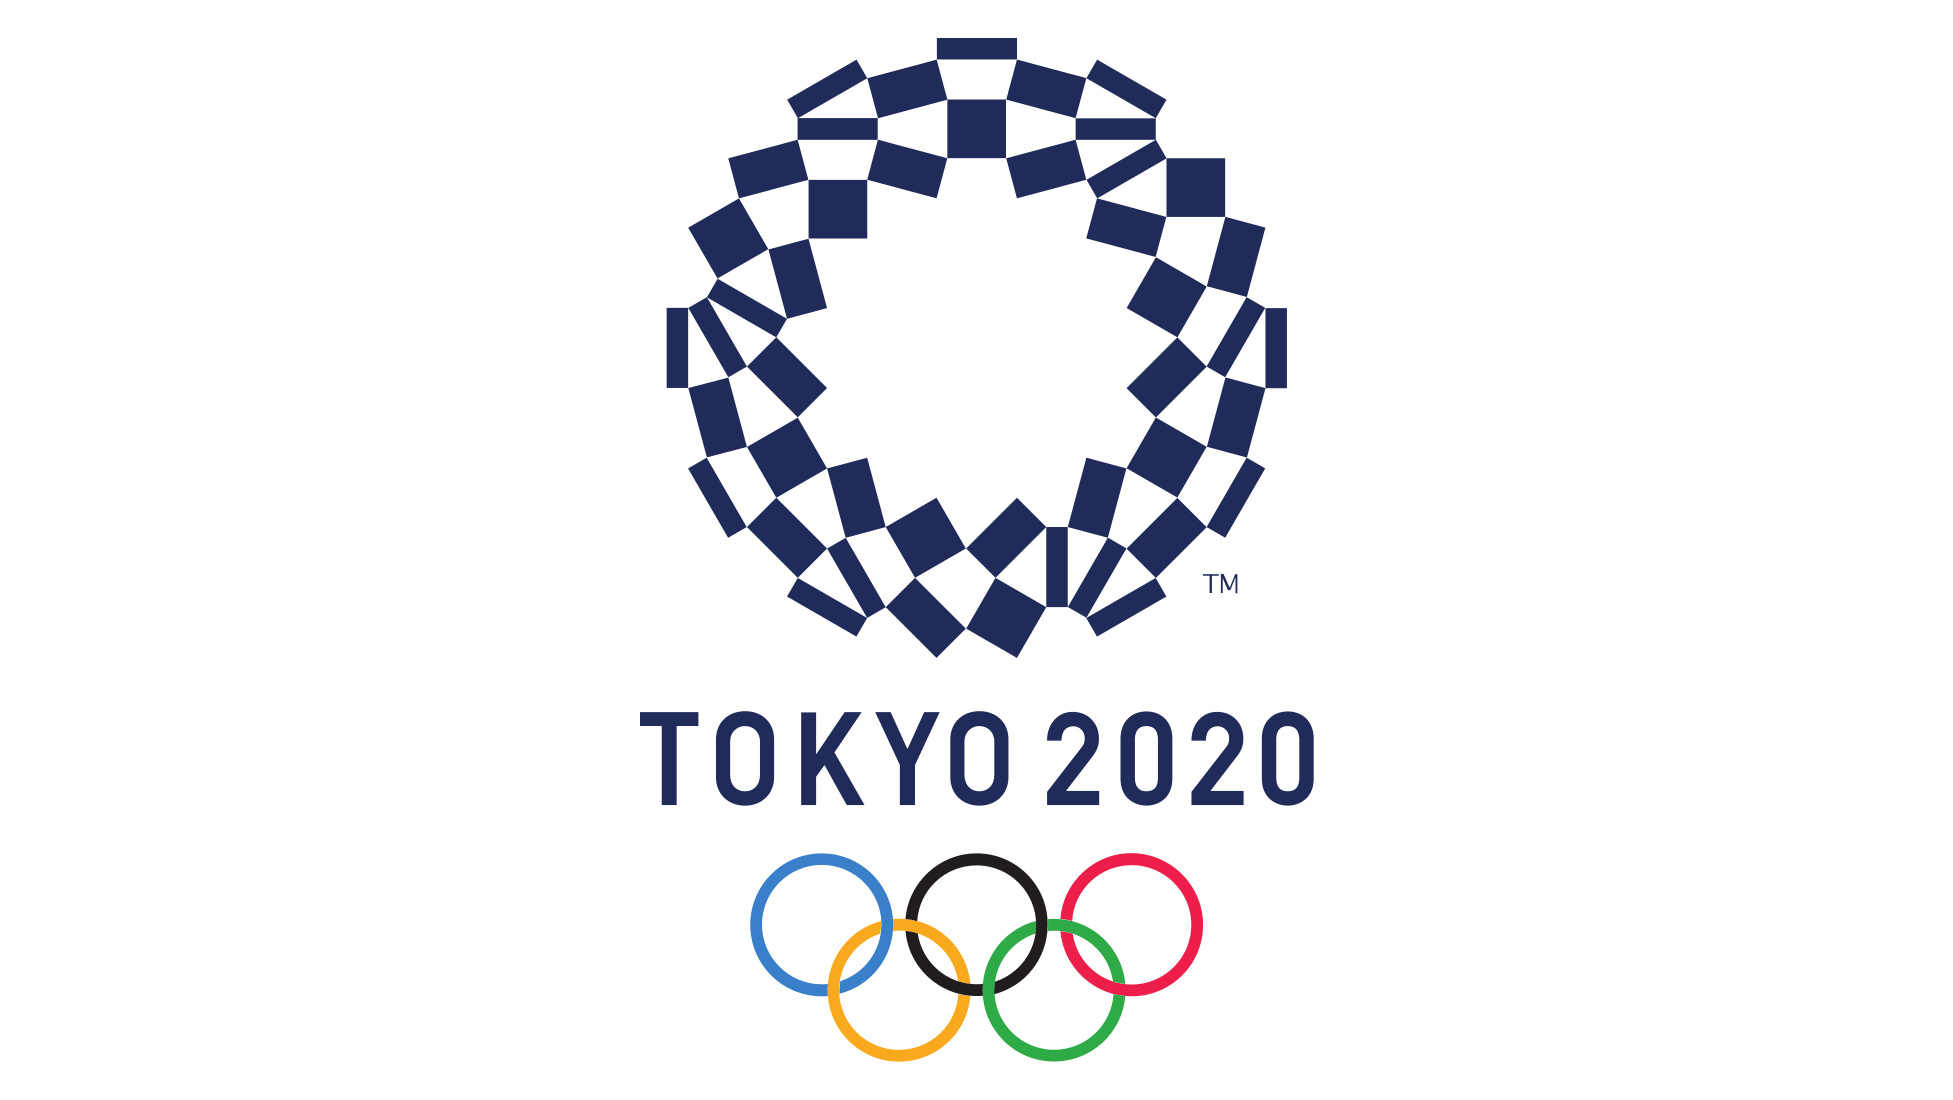 International Olympic Committee postpones 2020 Tokyo Games due to coronavirus pandemic